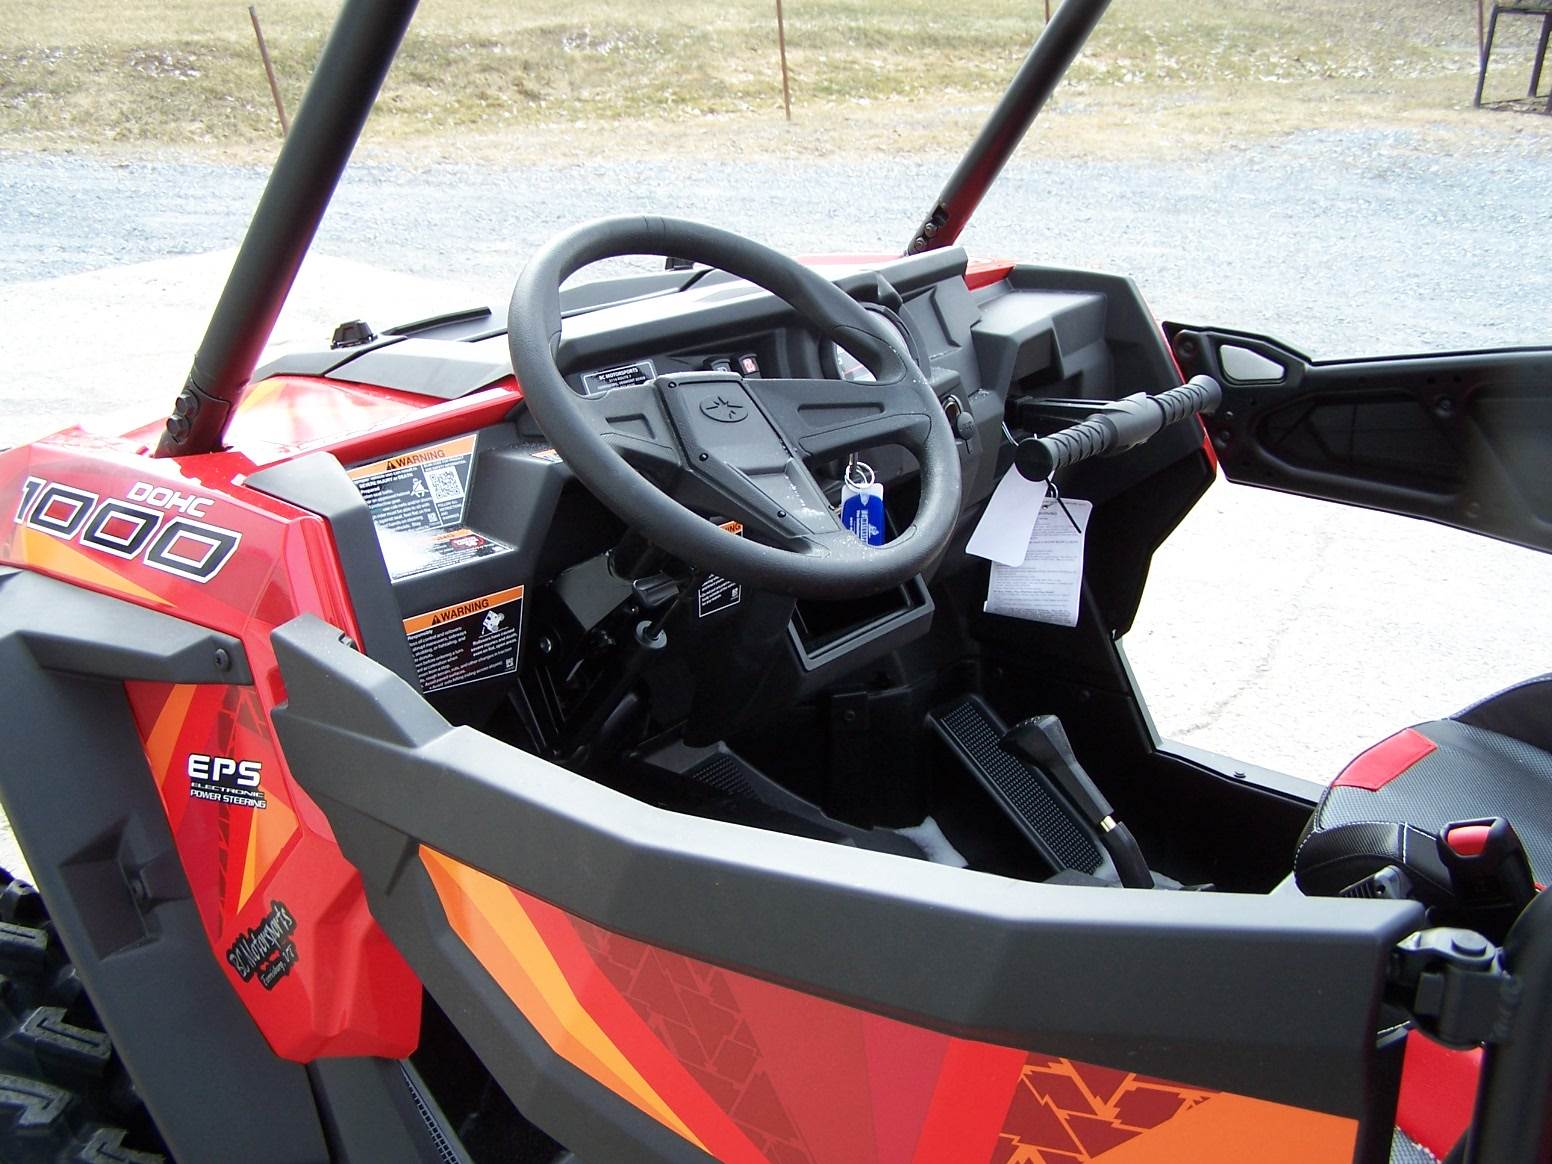 2017 Polaris RZR S 1000 EPS in Ferrisburg, Vermont